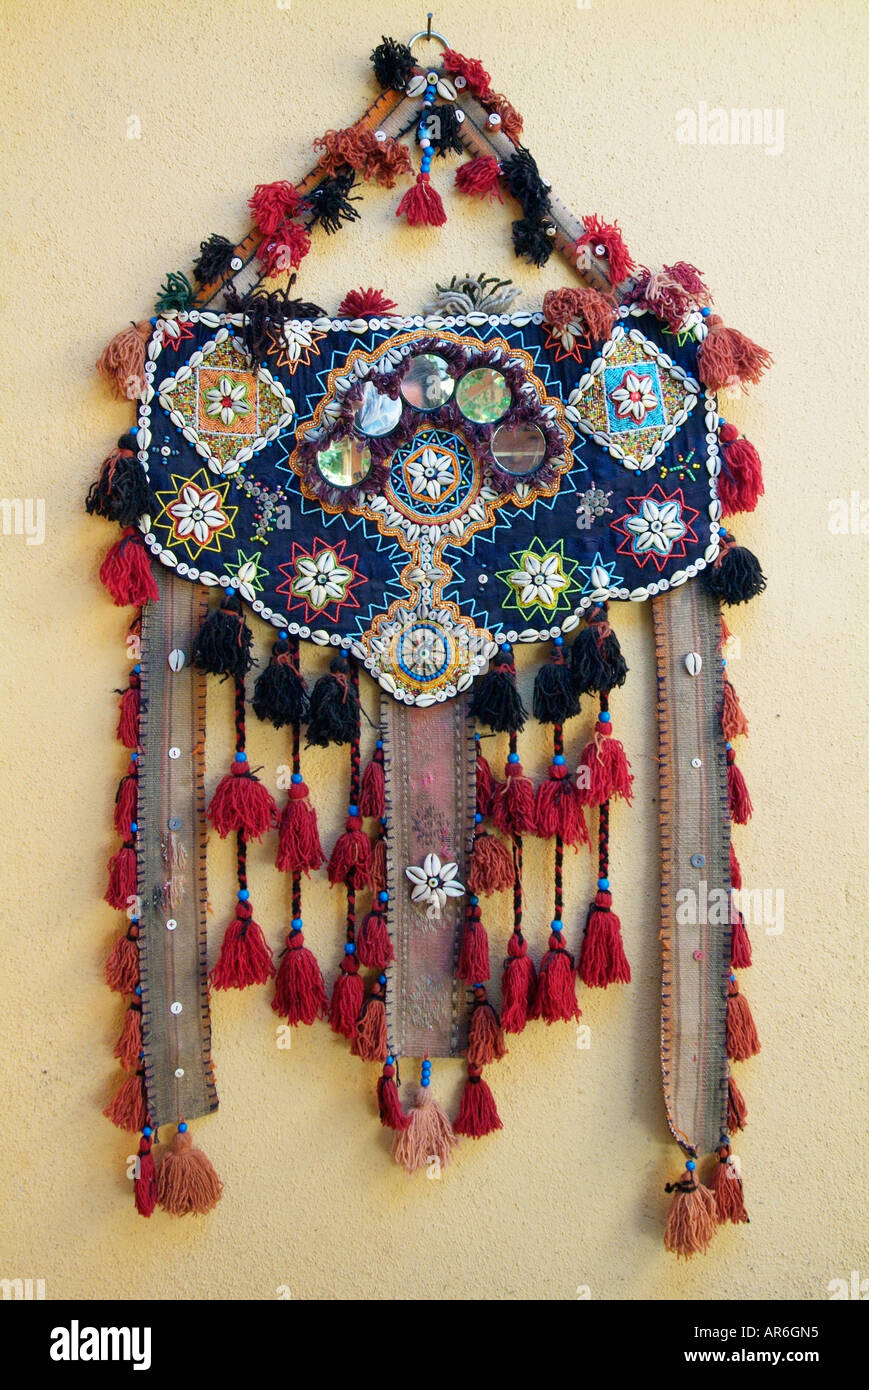 shop Turkey Fabric cloth drape weekly market shop bazaar trade ...